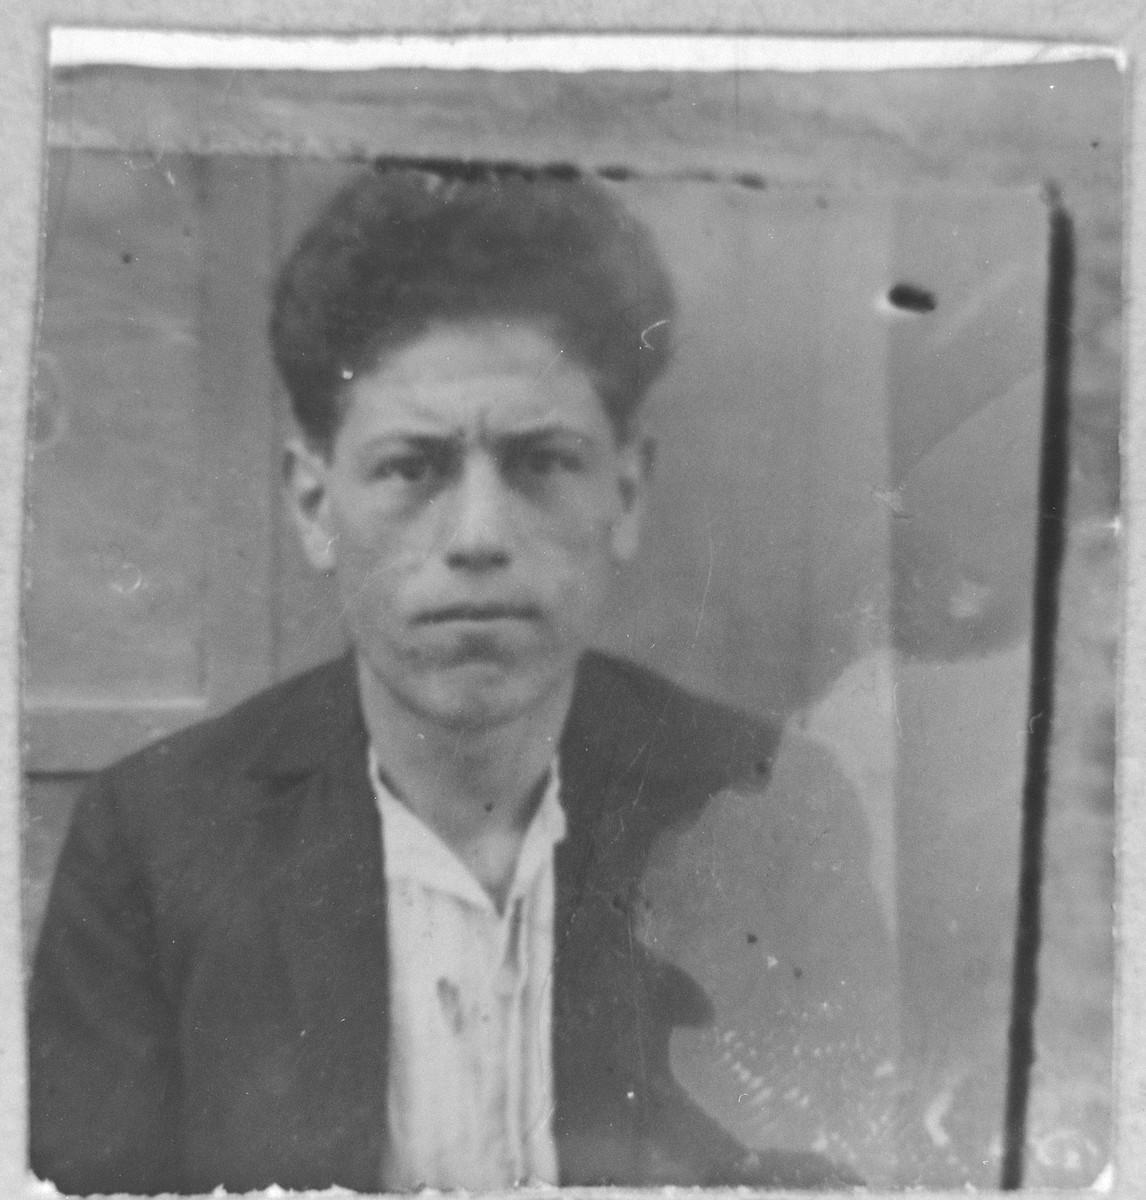 Portrait of Isak Pardo.  He lived on Karagoryeva in Bitola.